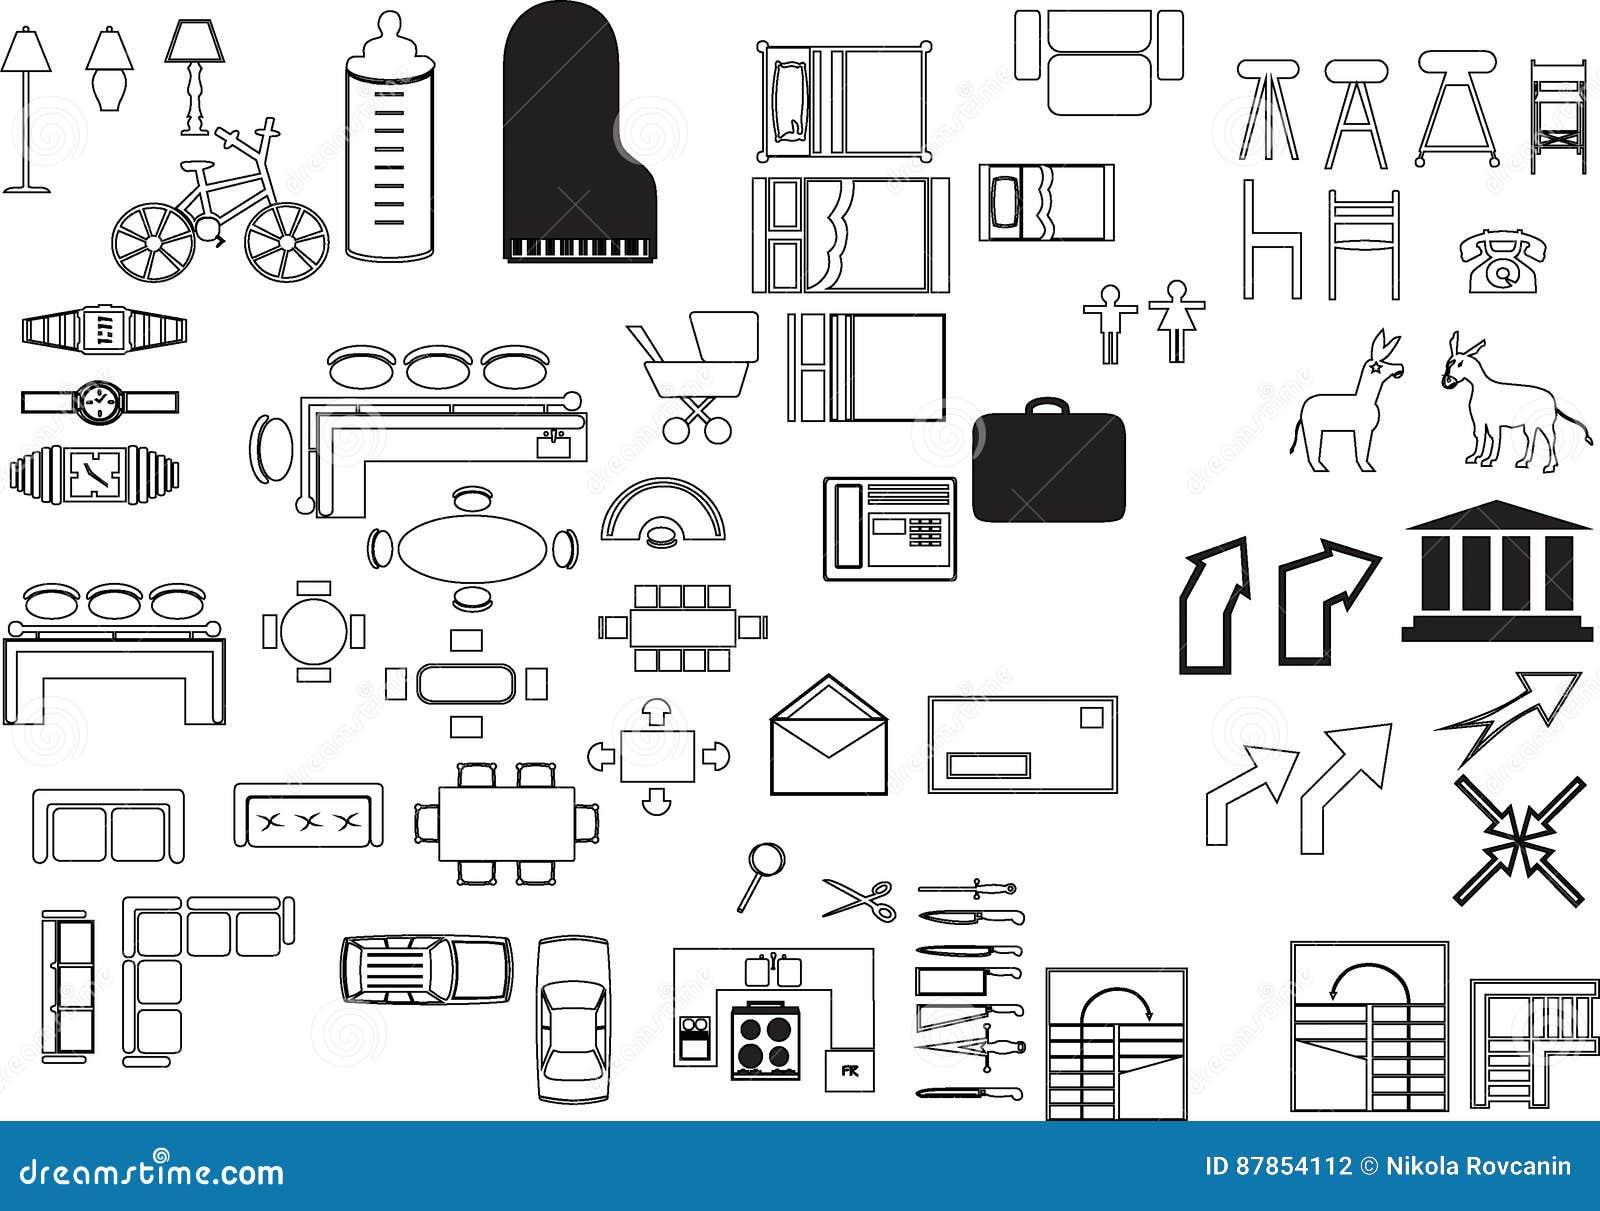 Illustrations elements